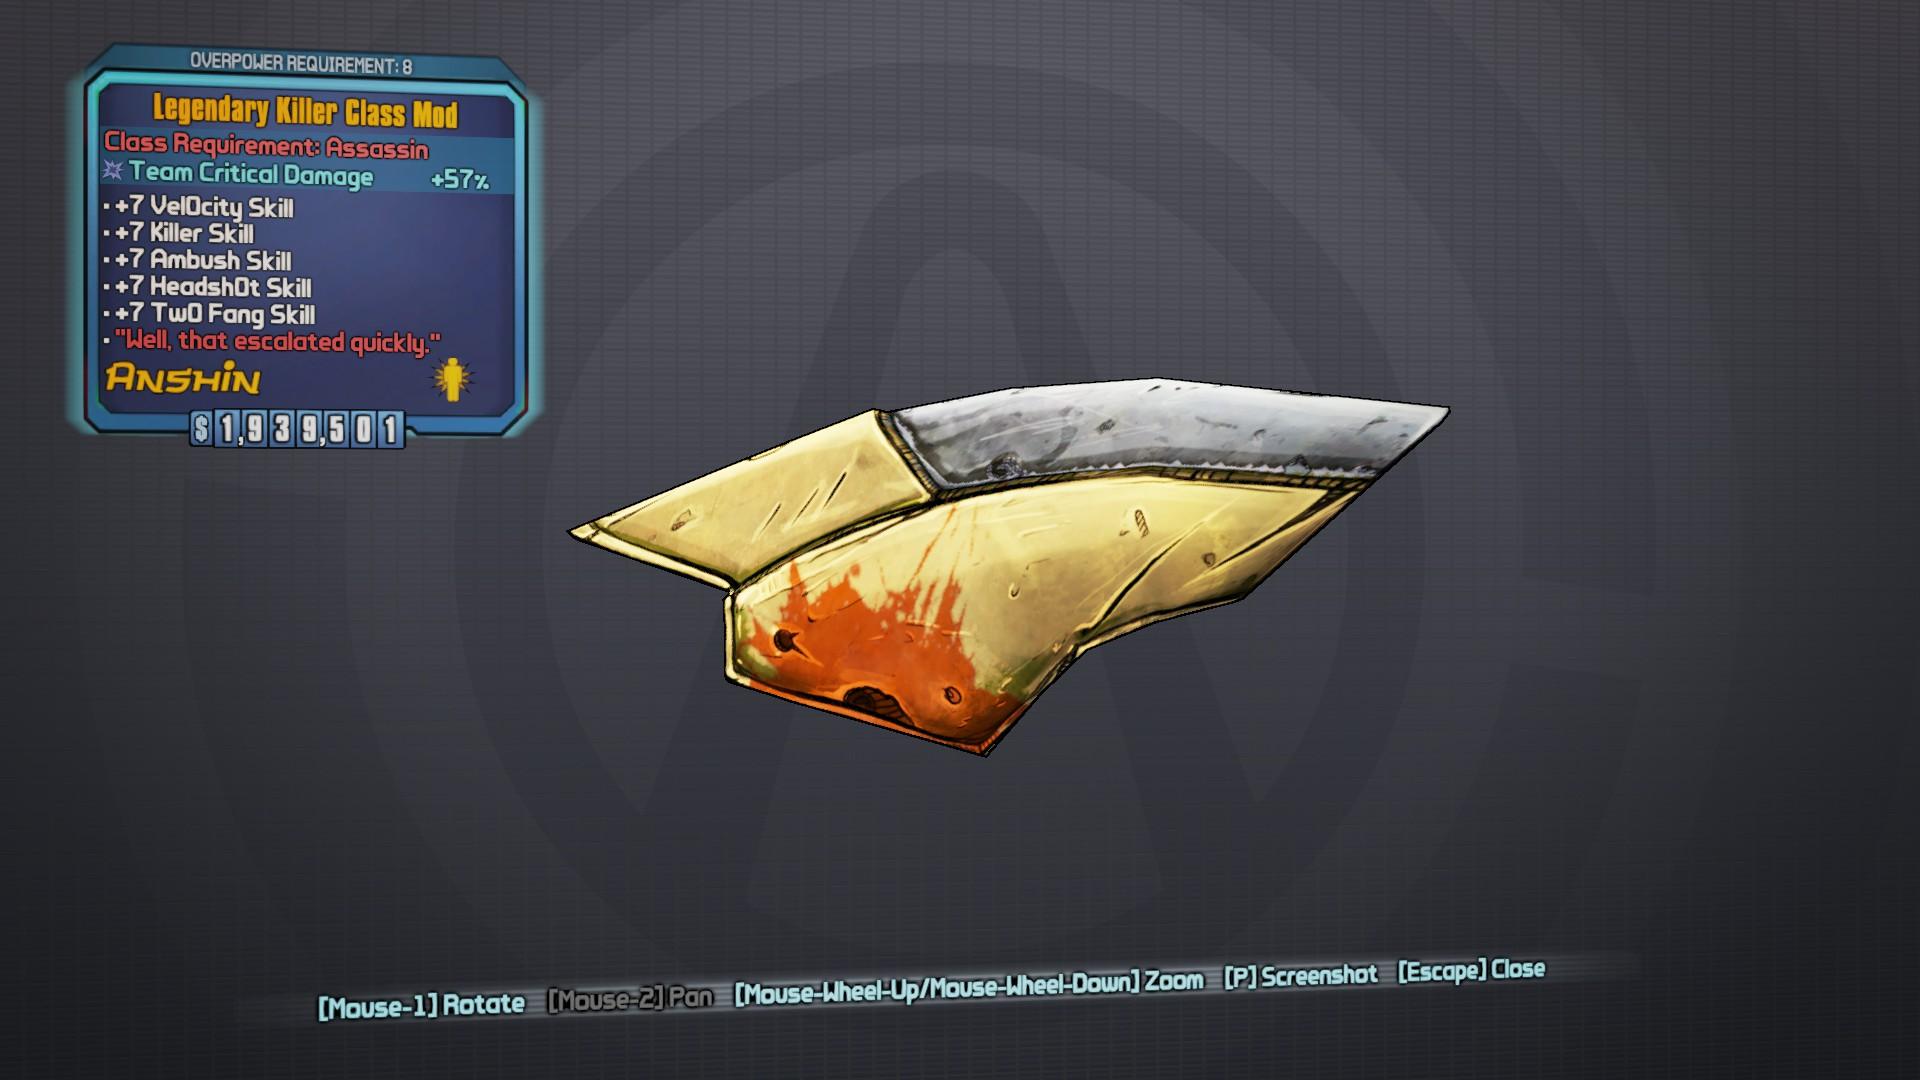 Legendary Killer | BL2reborn Wiki | FANDOM powered by Wikia